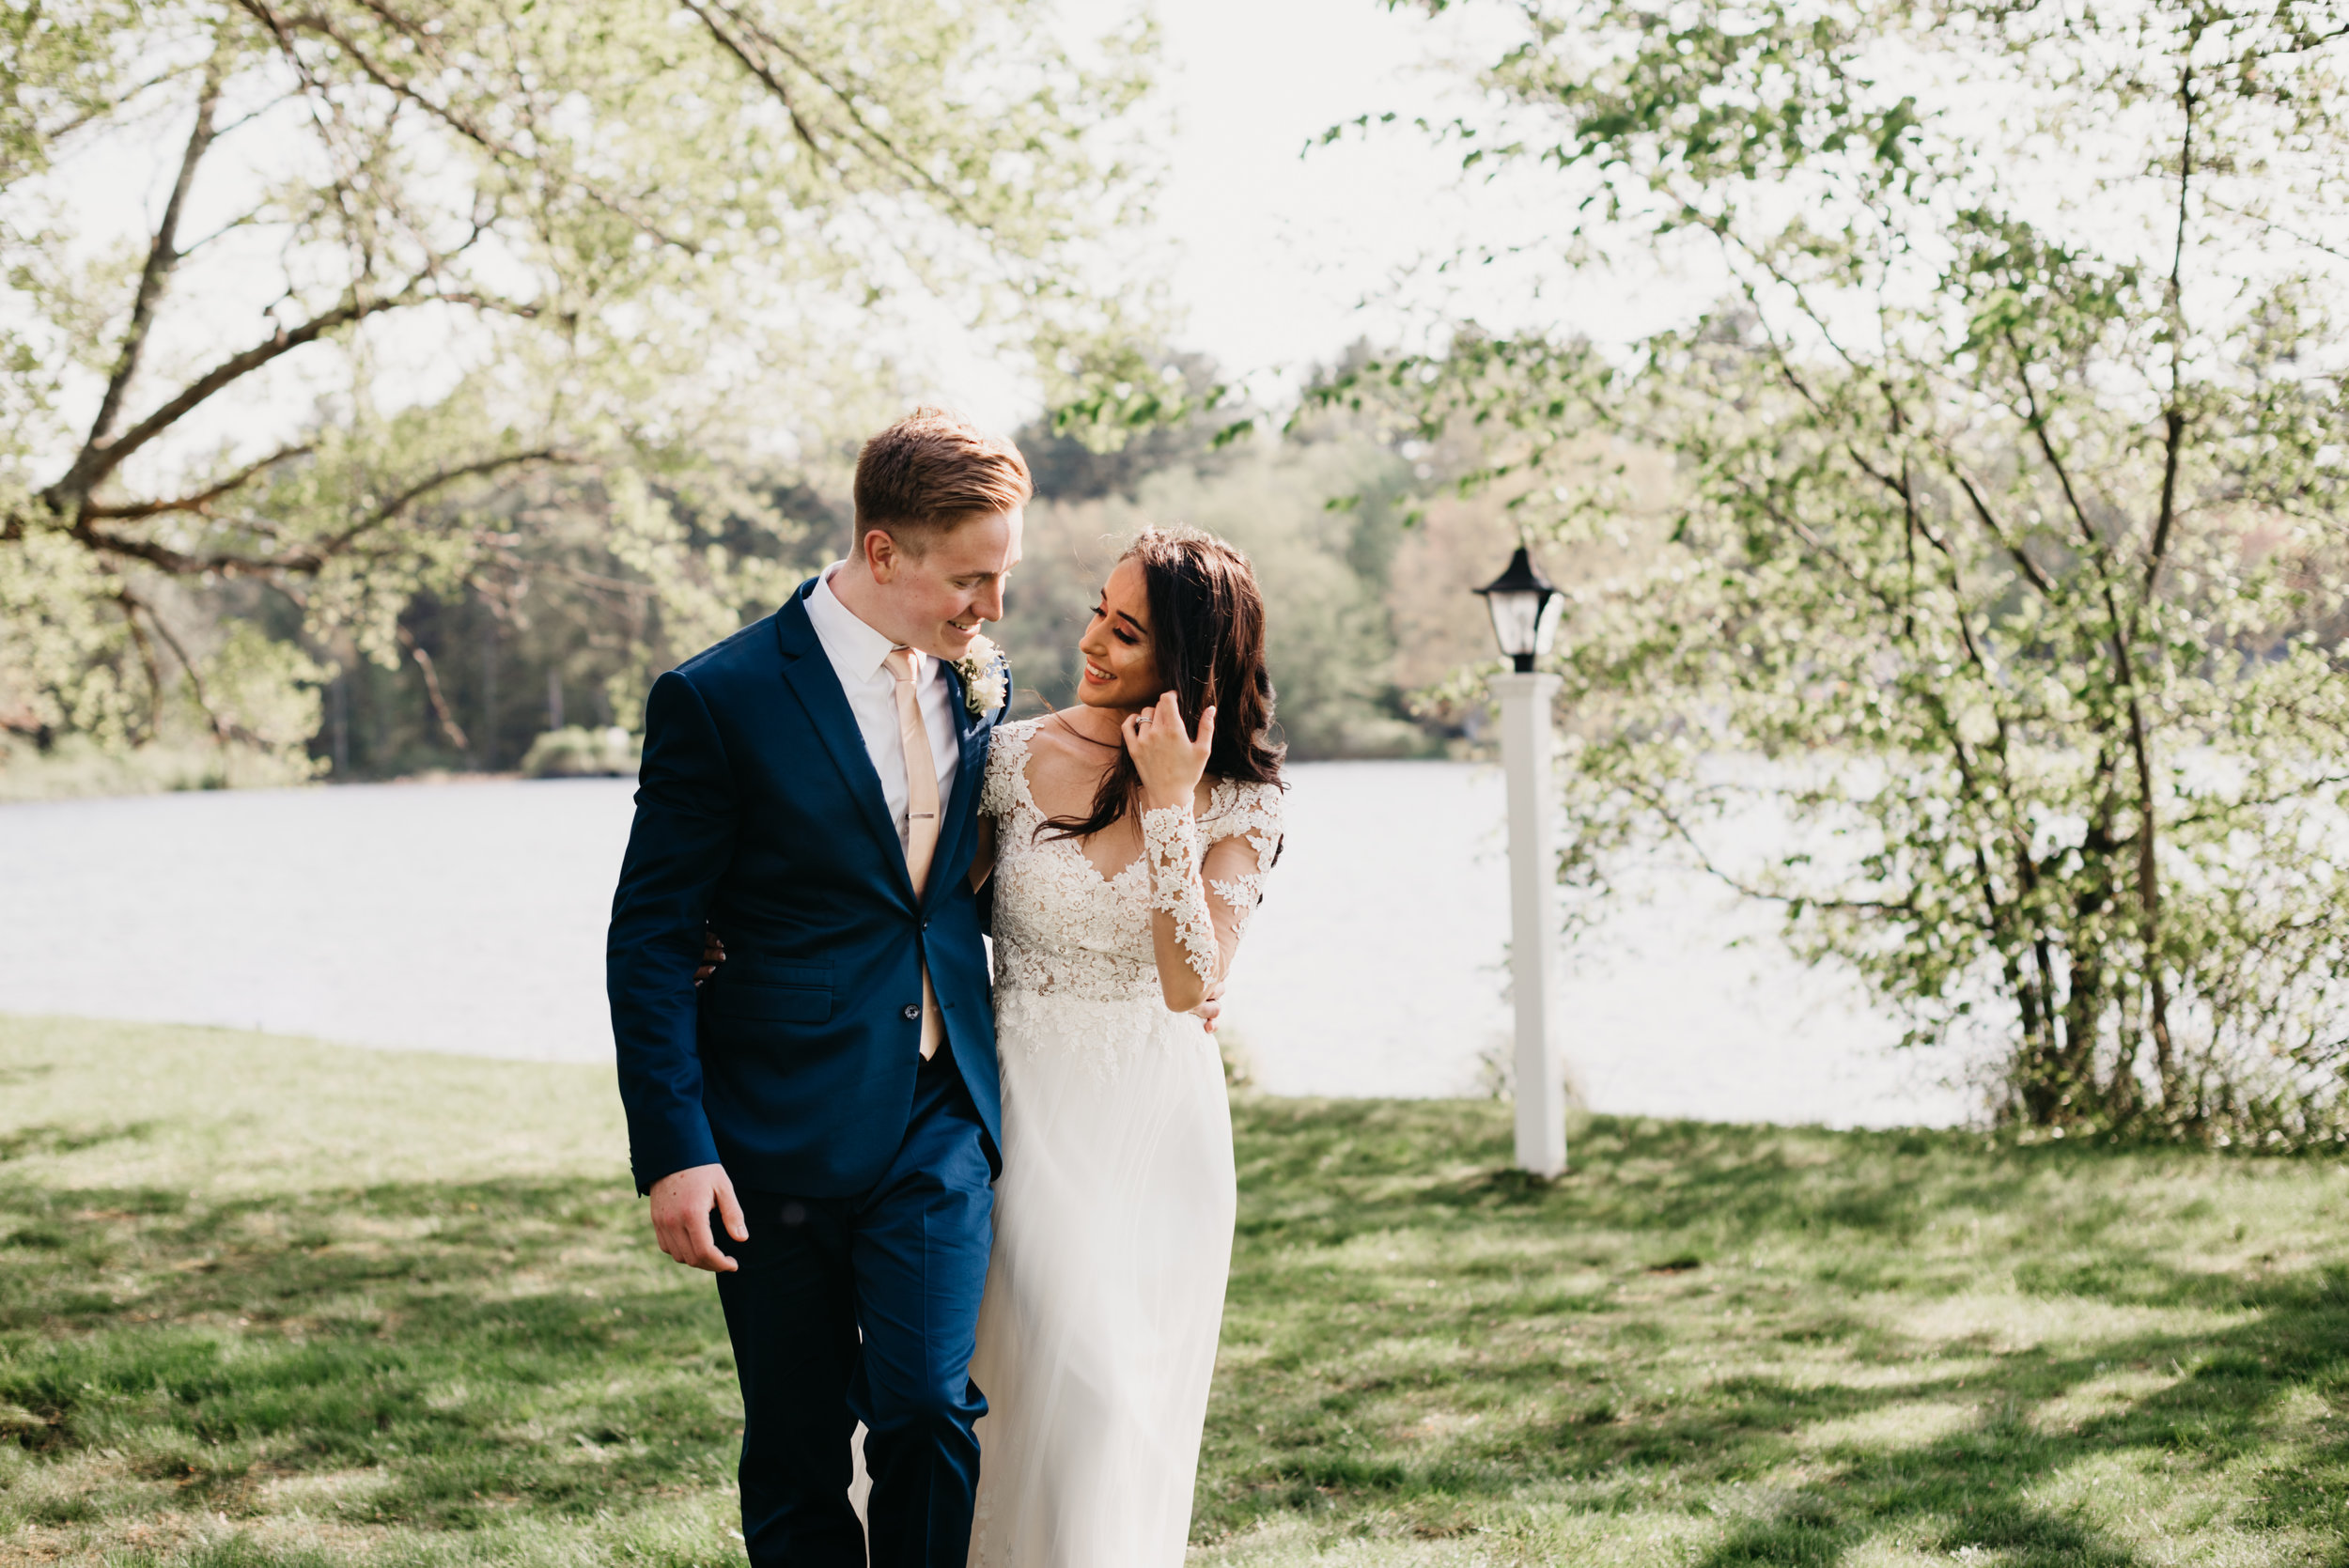 Barch-Massachusetts-Lakeside Tent Wedding-Western Massachusetts Wedding Photographer-01794.jpg